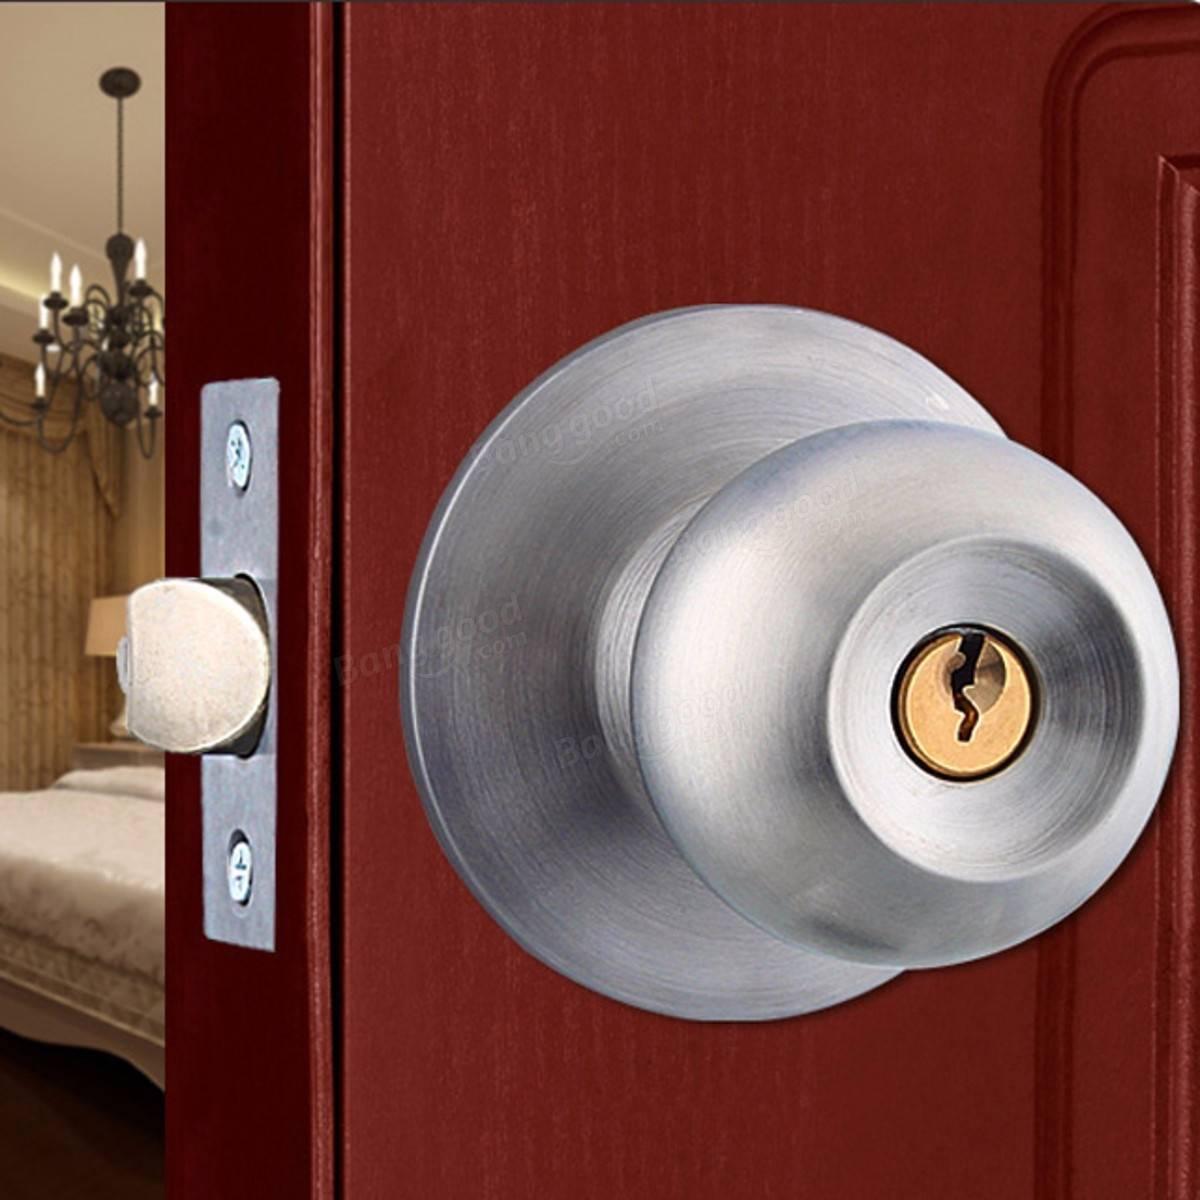 door knob lock out photo - 7